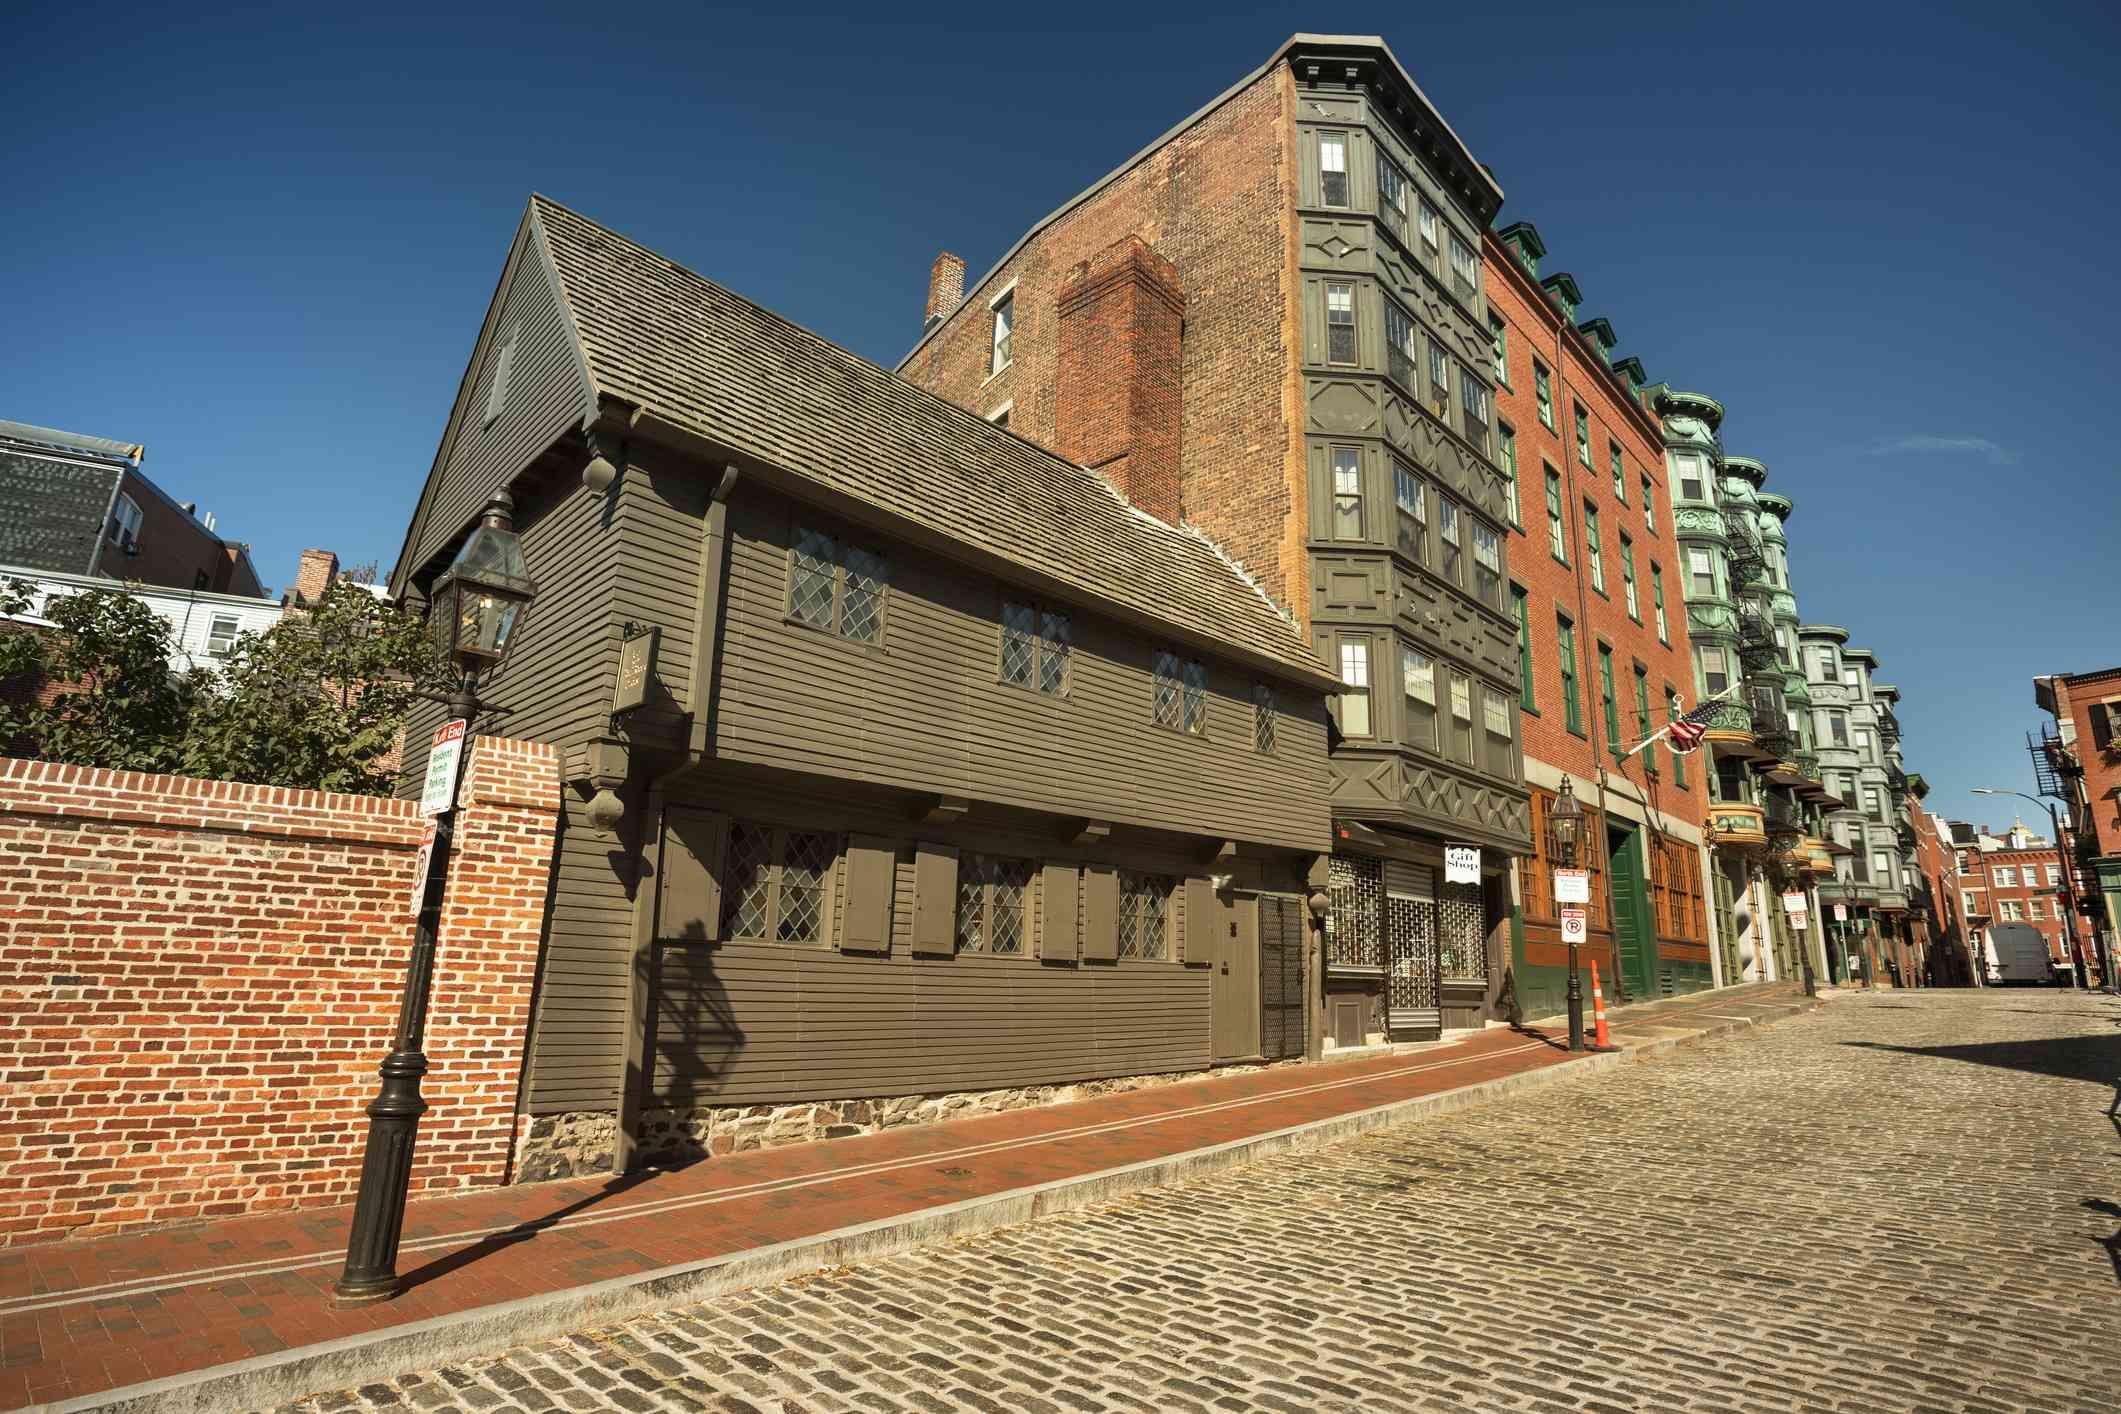 Casa Paul Revere en Boston, Massachusetts, EE. UU.